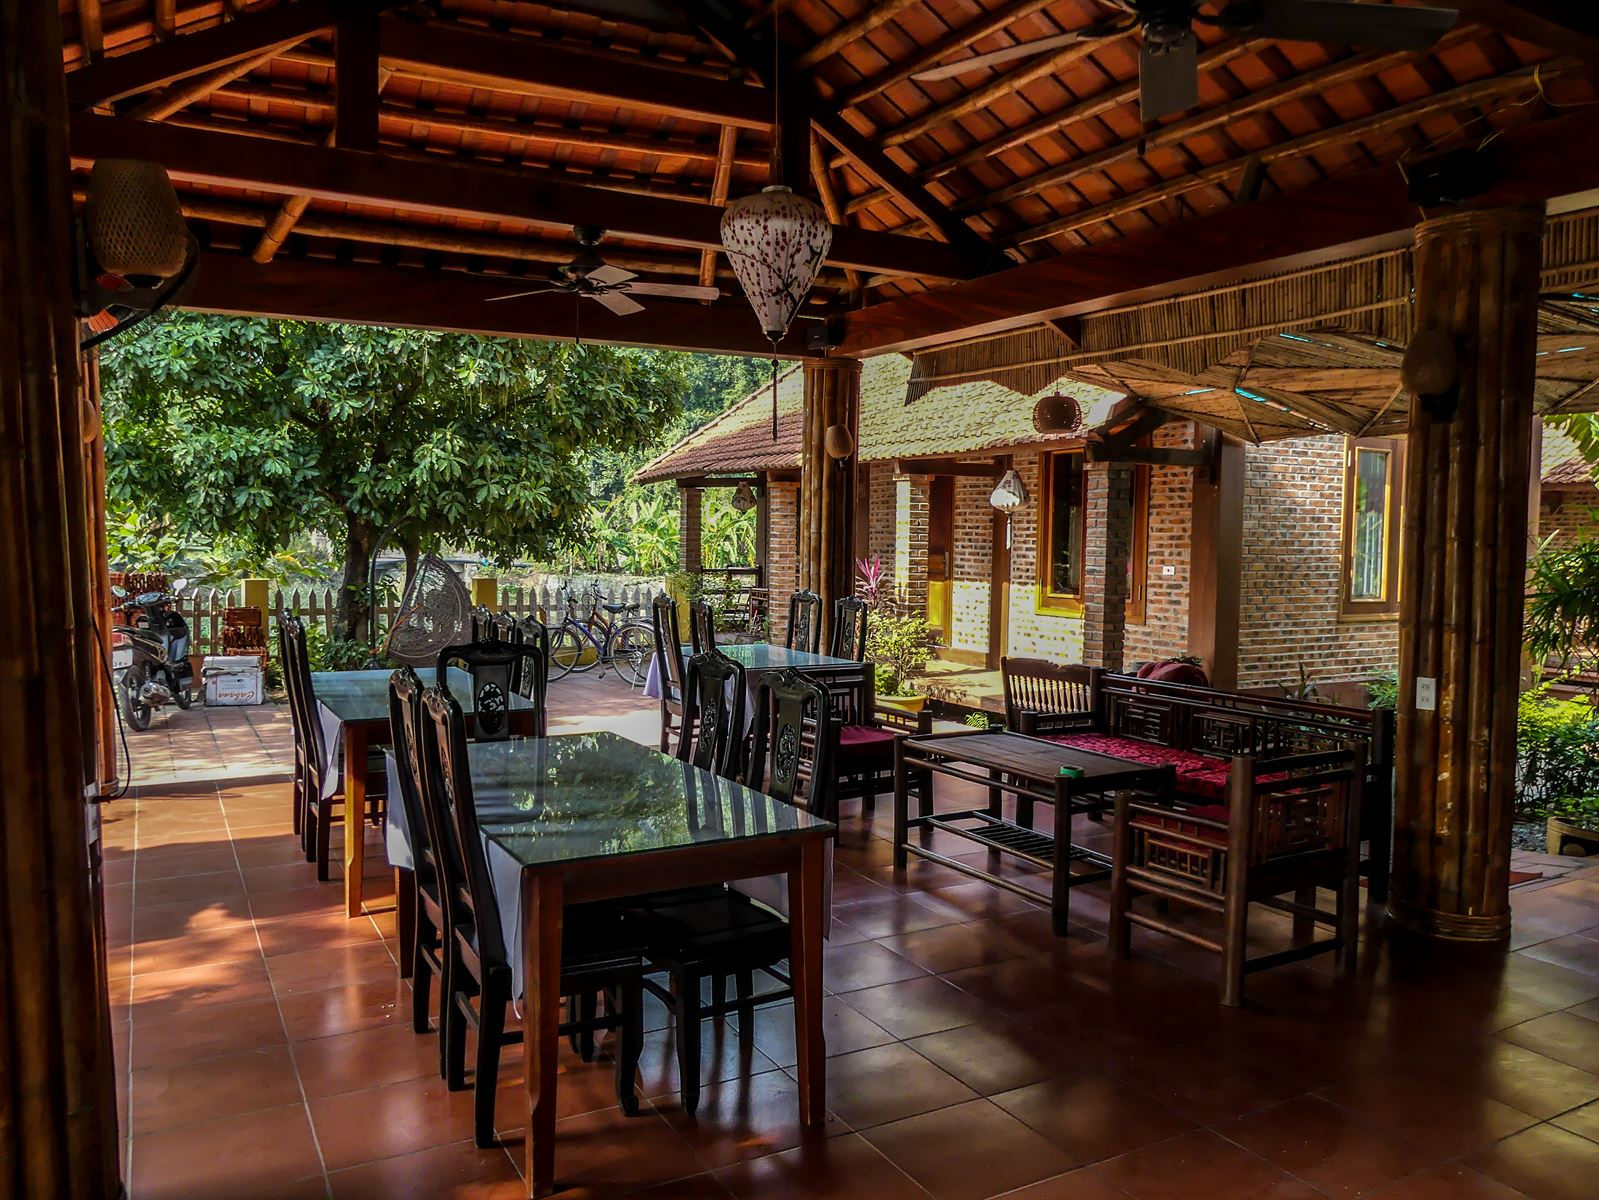 Chez Loan Ninh Binh - Tam Coc - Baie d'Halong terrestre